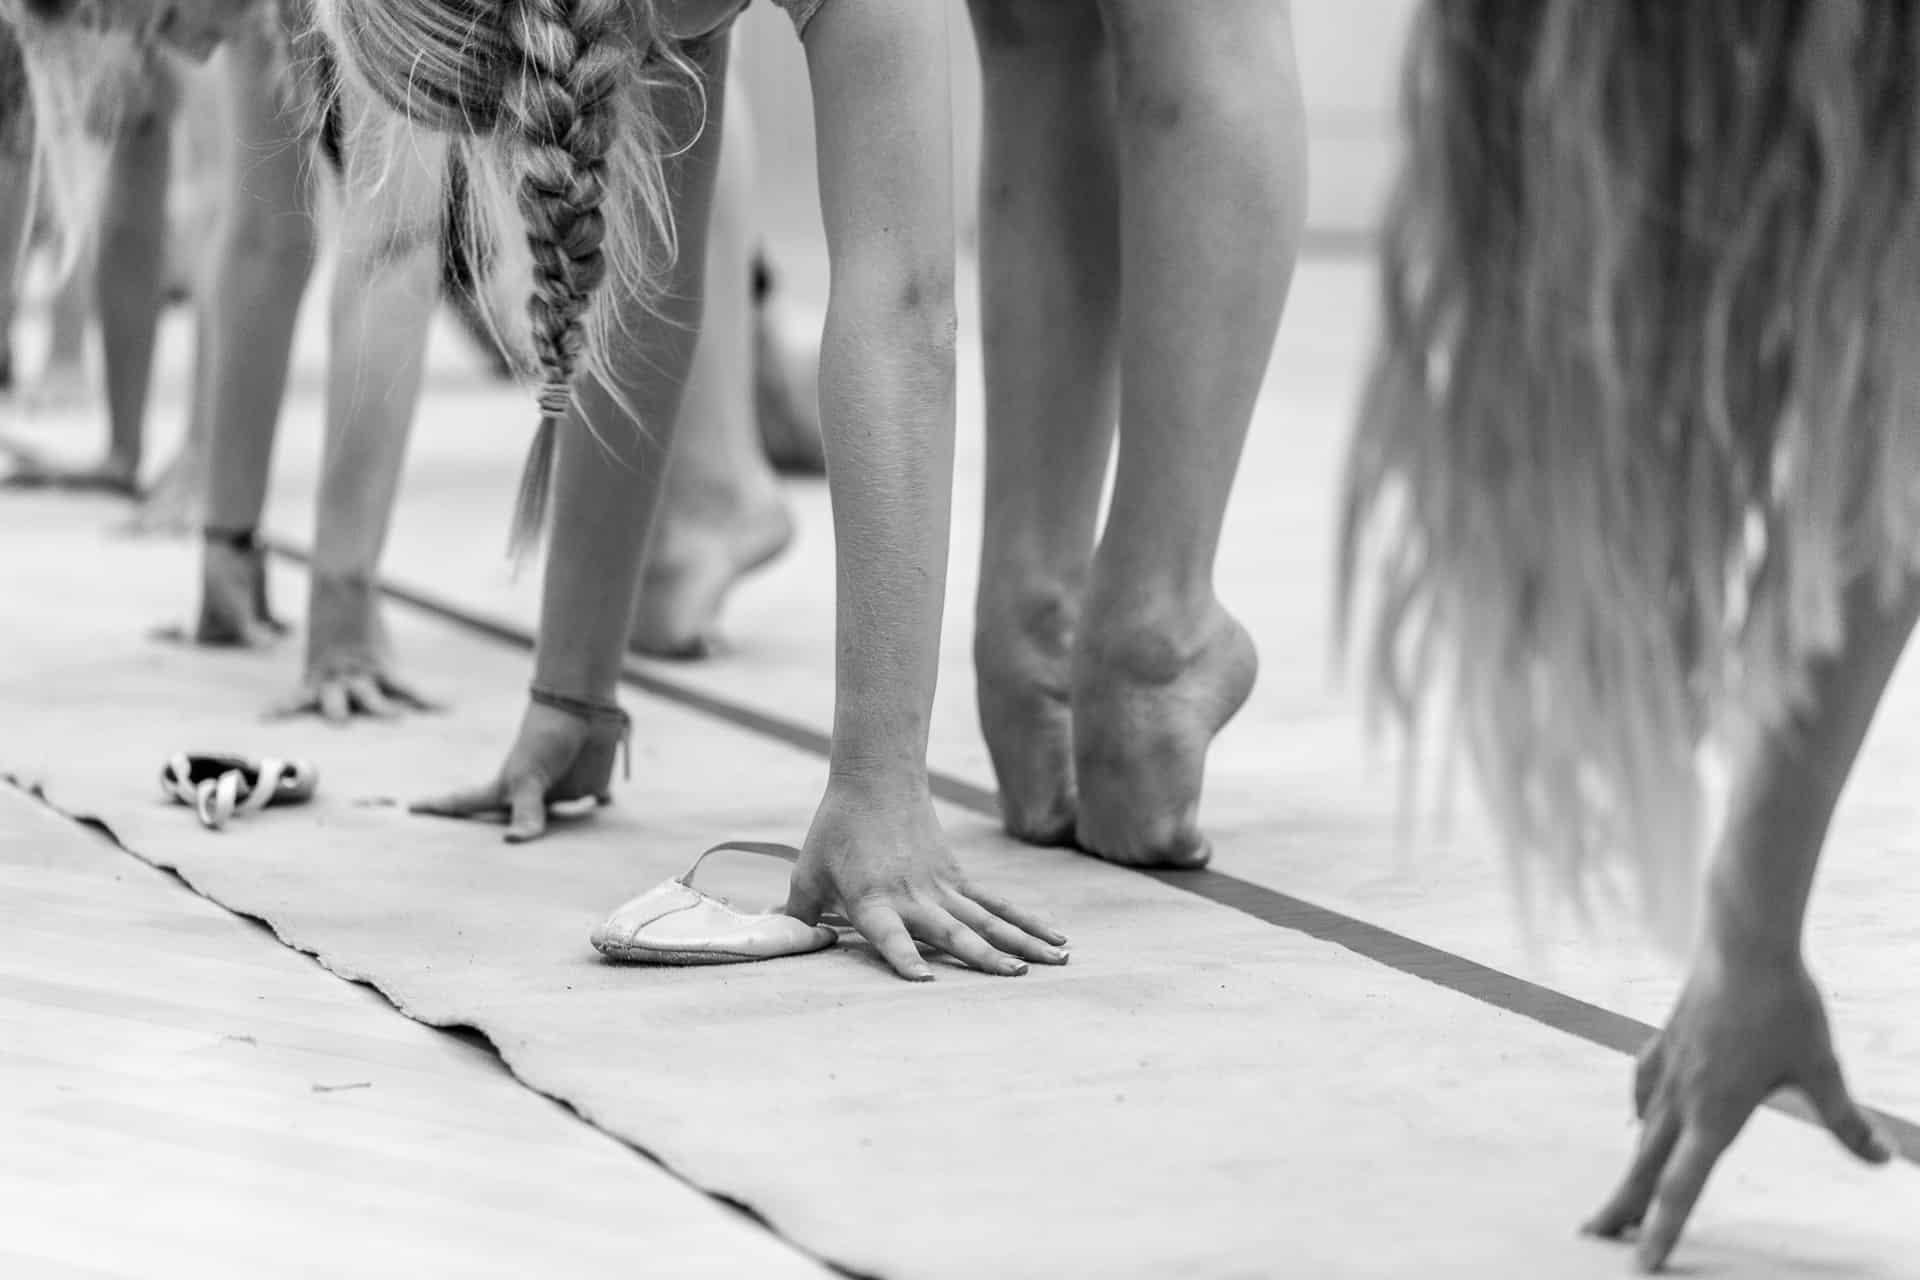 Leas Gymnastik – Journalistiskt examensprojekt